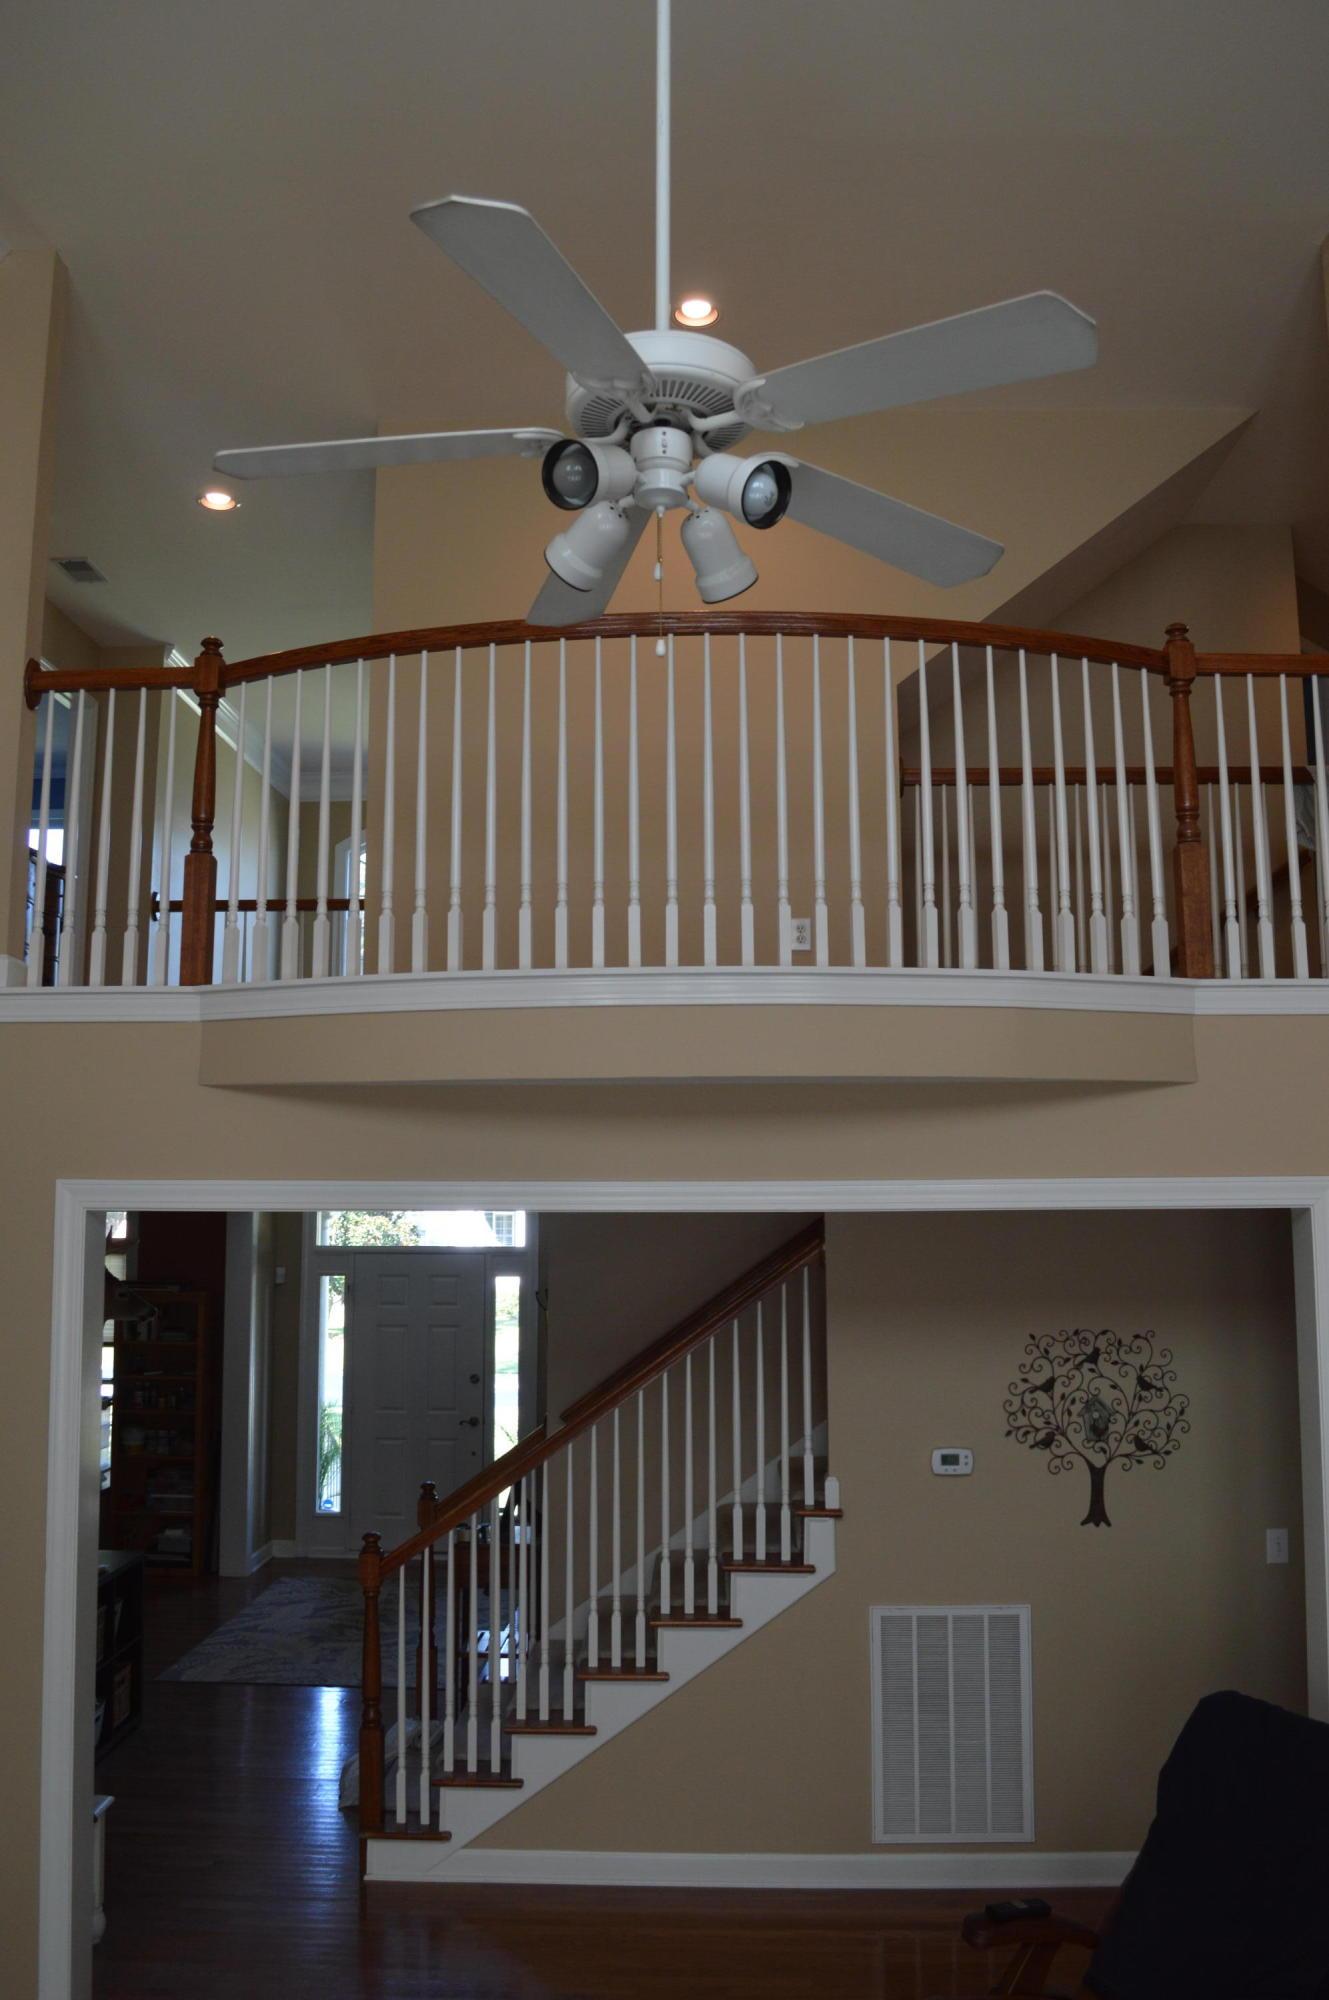 Dunes West Homes For Sale - 1345 White Deer, Mount Pleasant, SC - 23